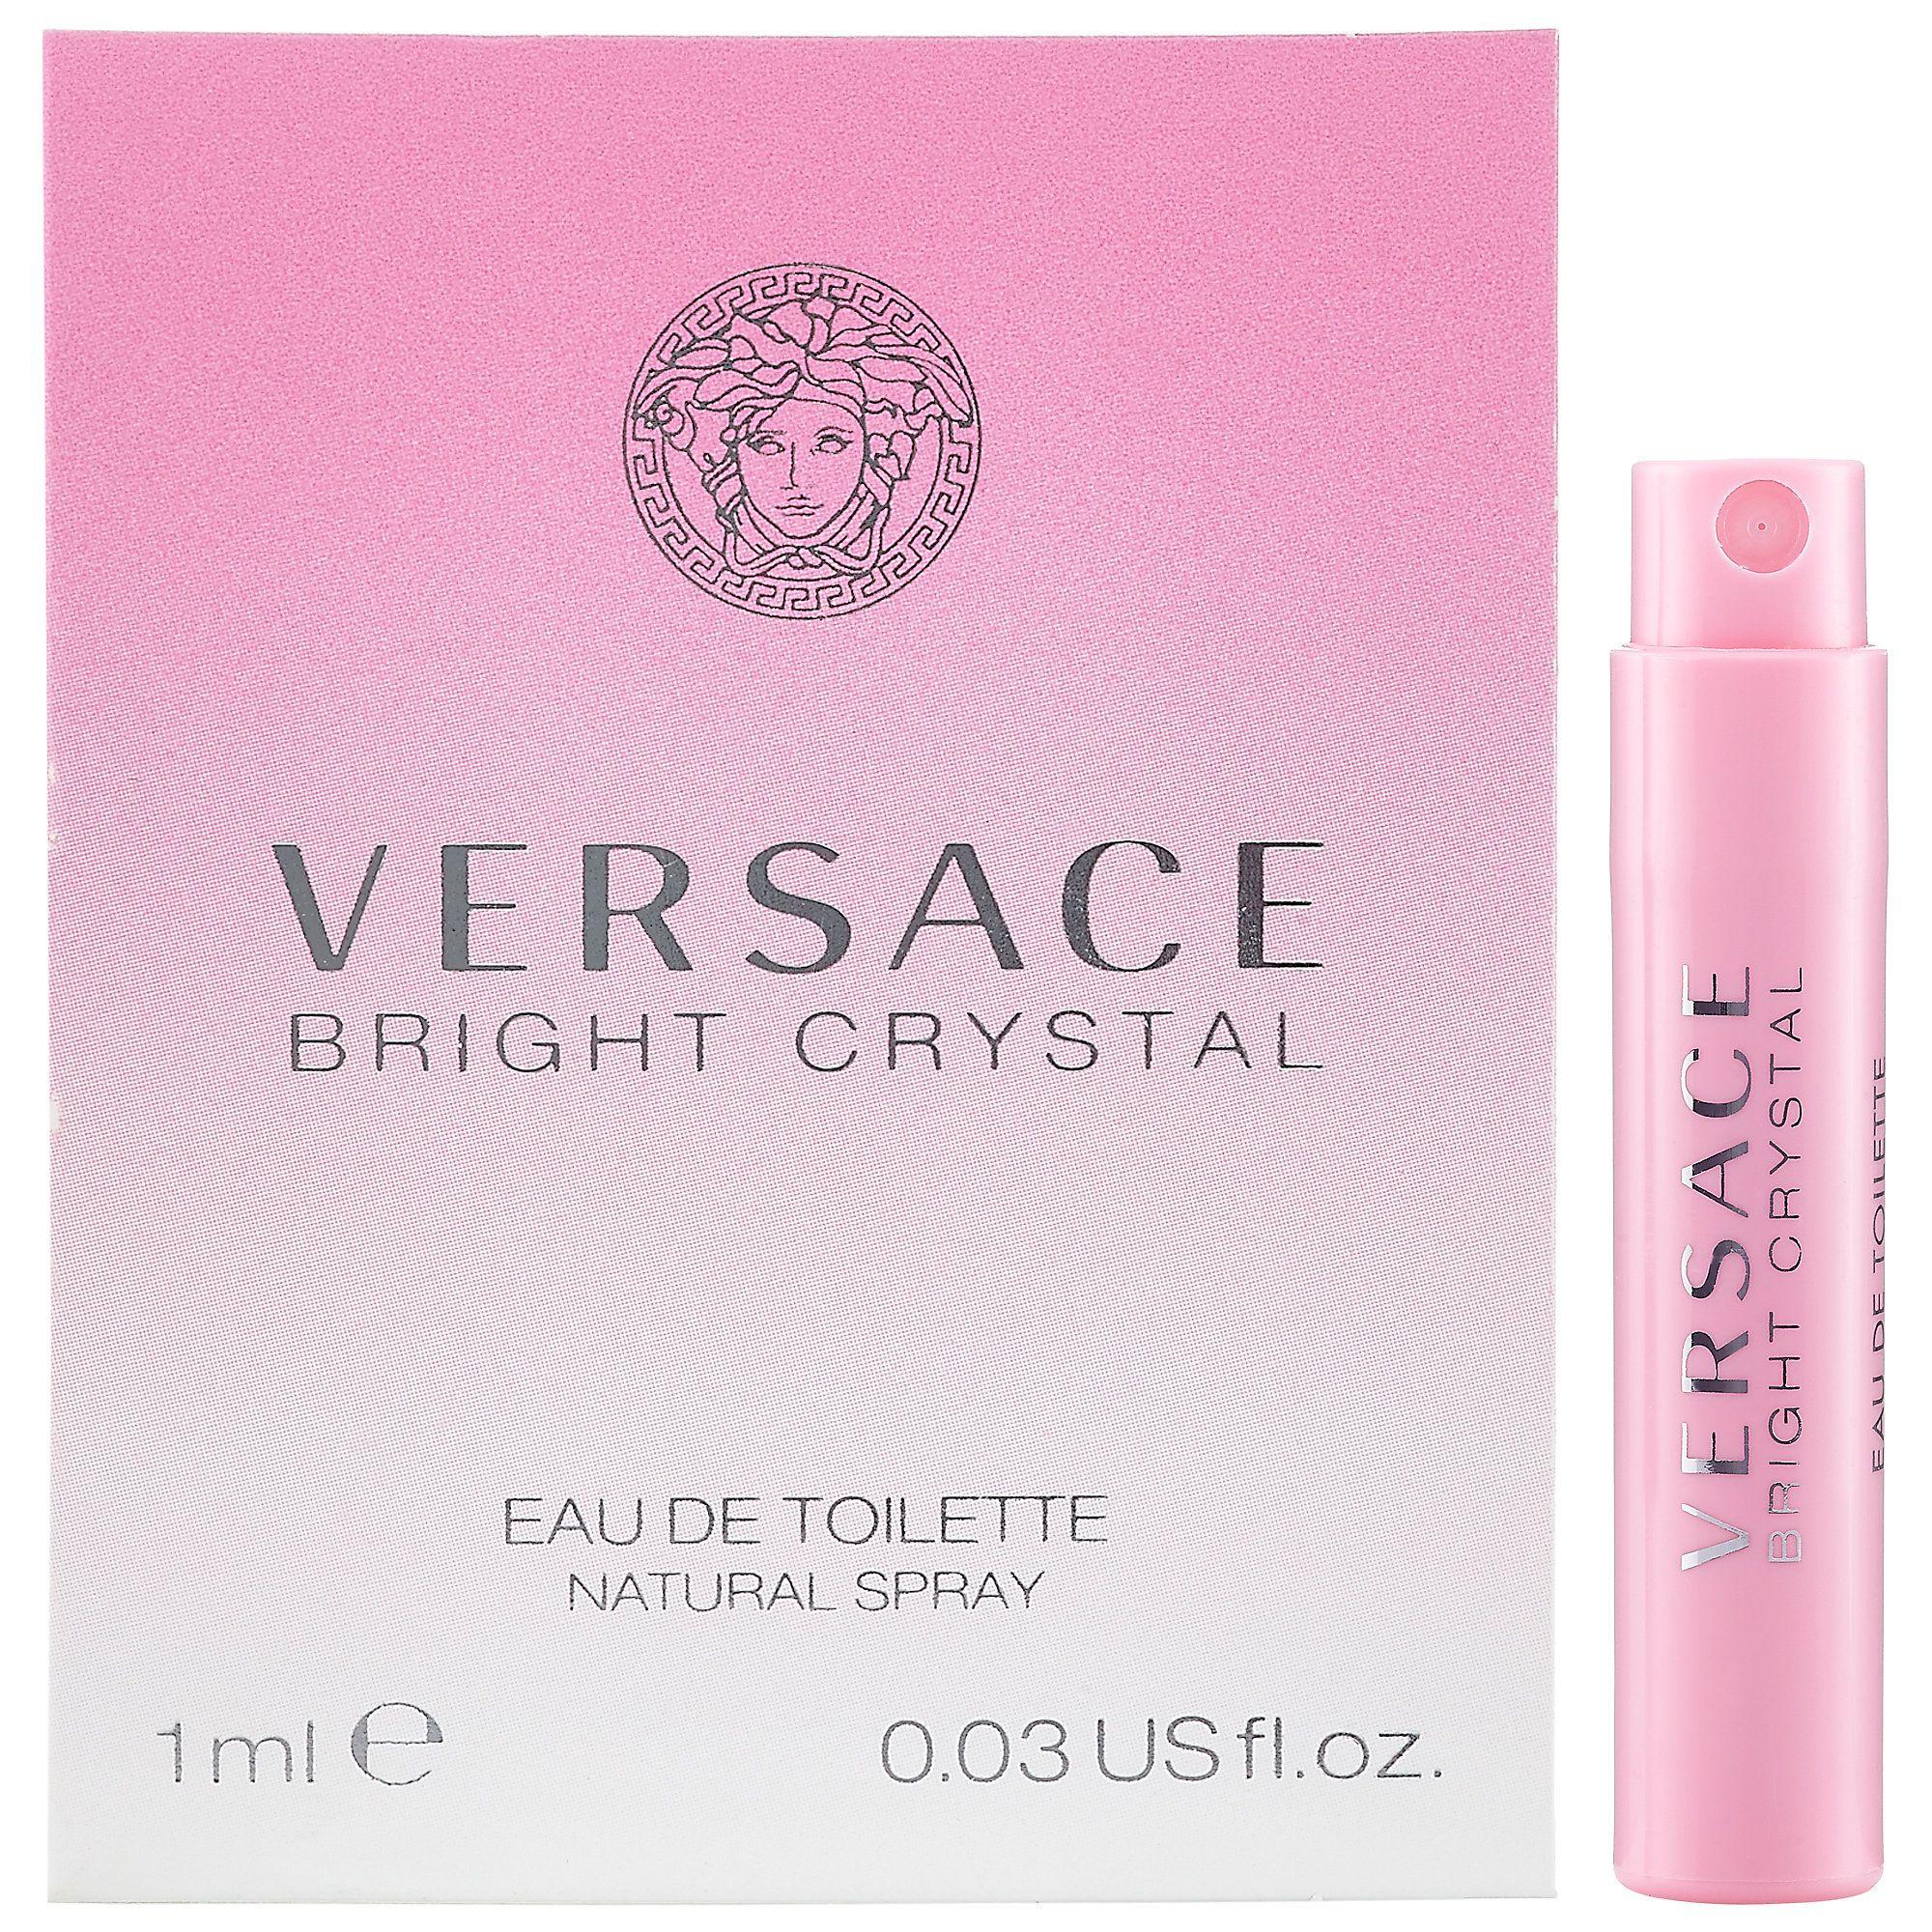 versace perfume samples